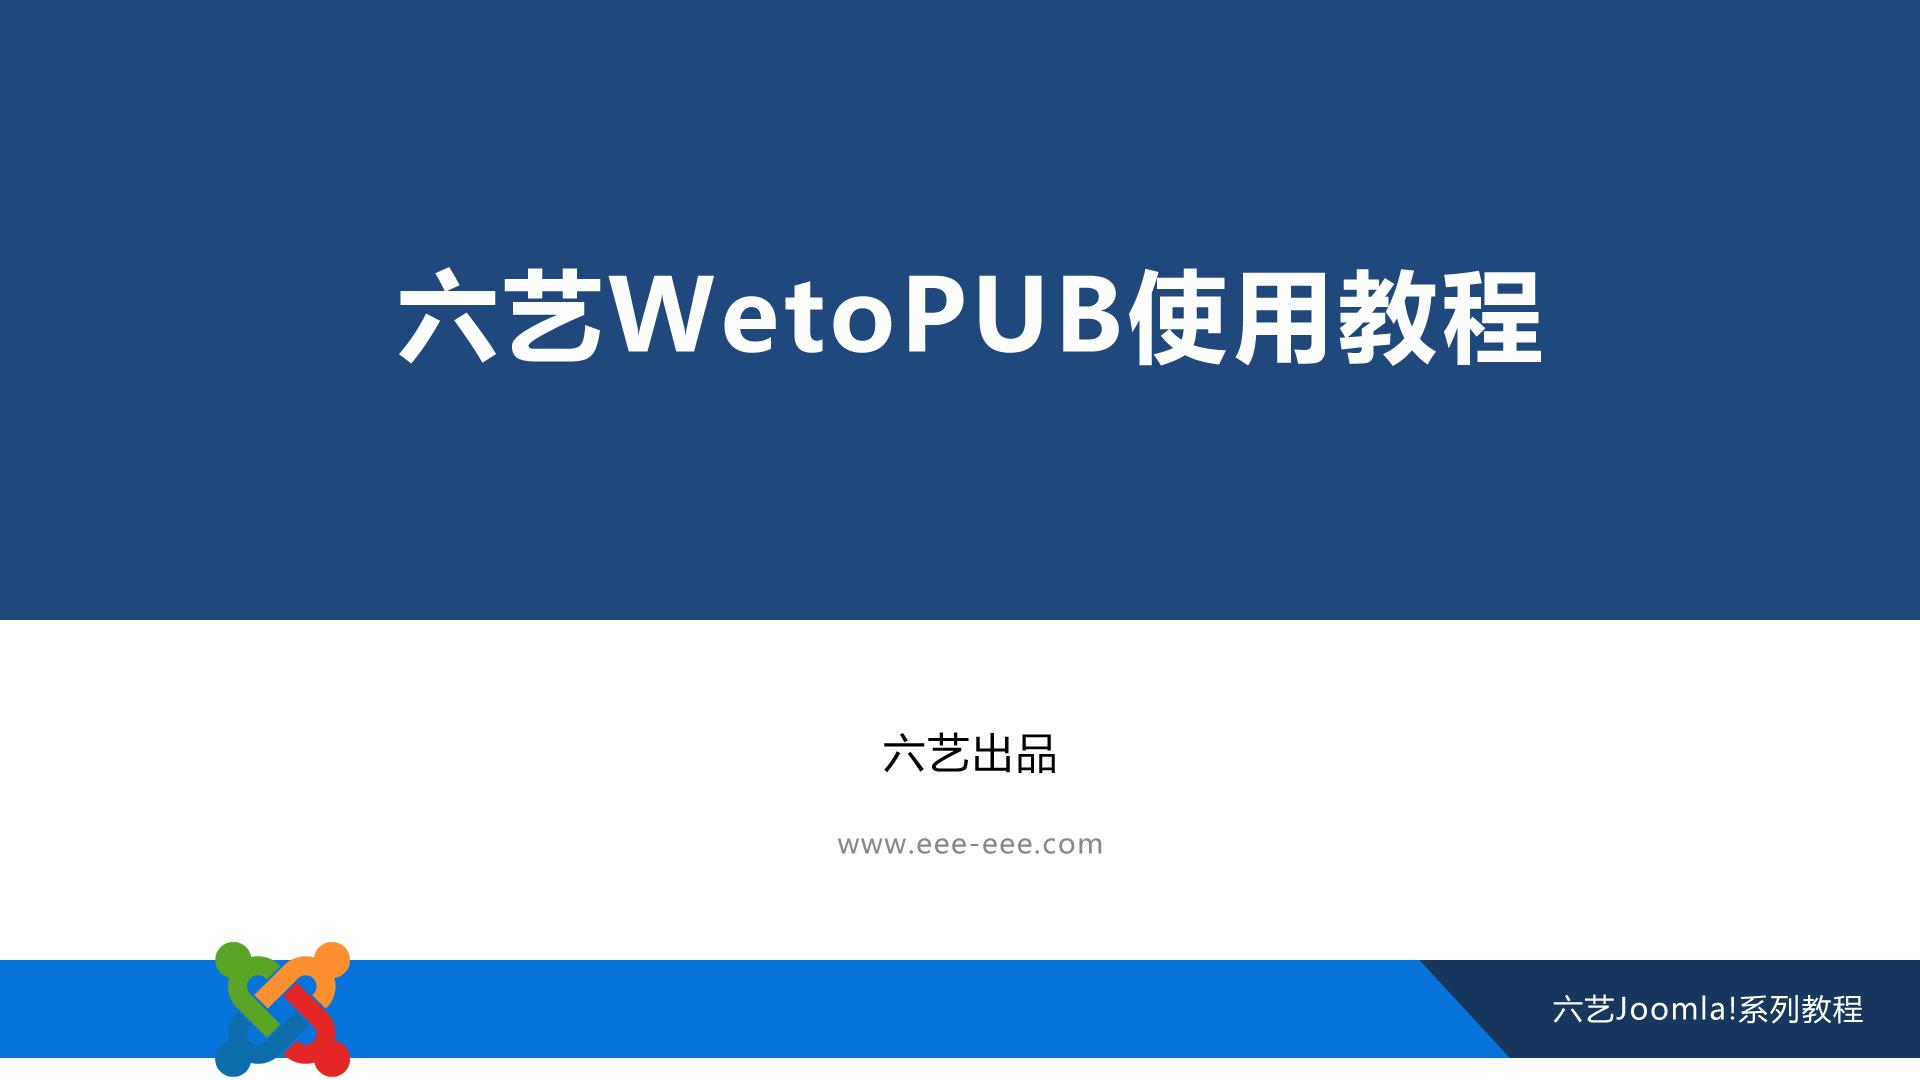 WetoPUB视频教程